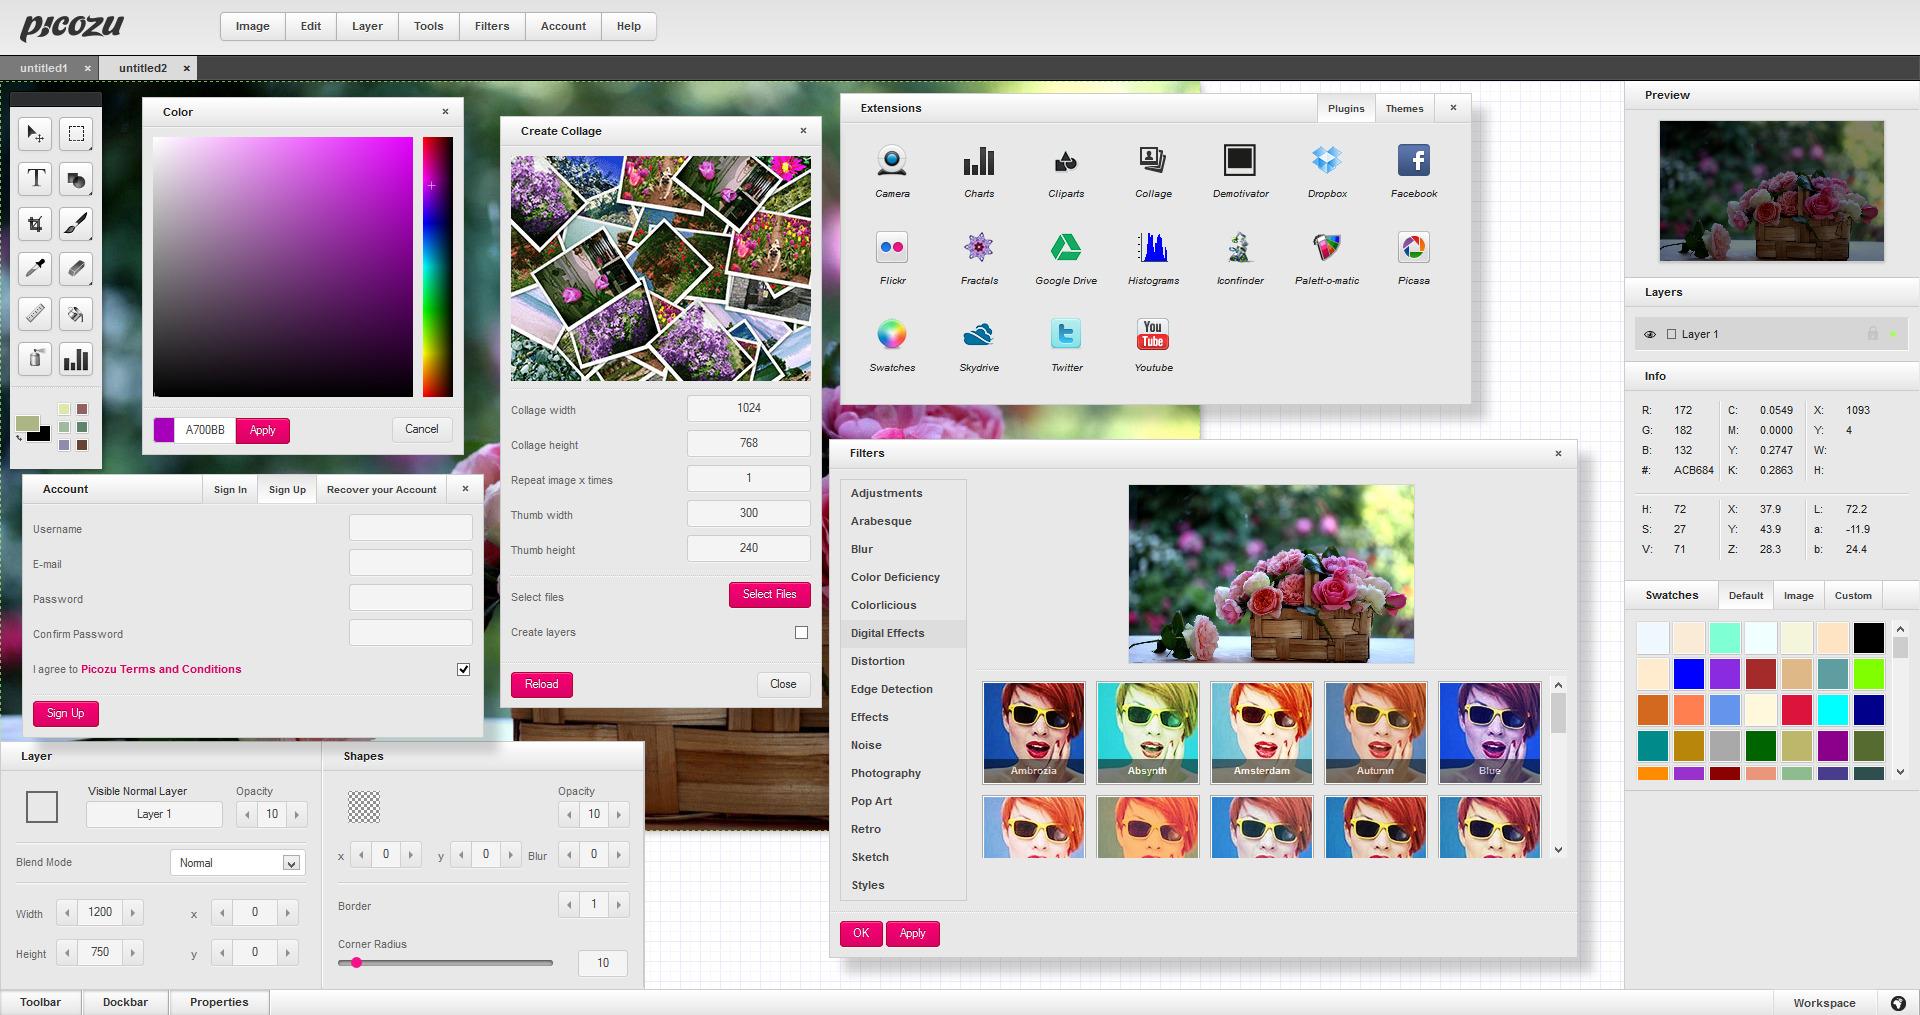 Picozu – Free Online Image Editor – AB's Reflections